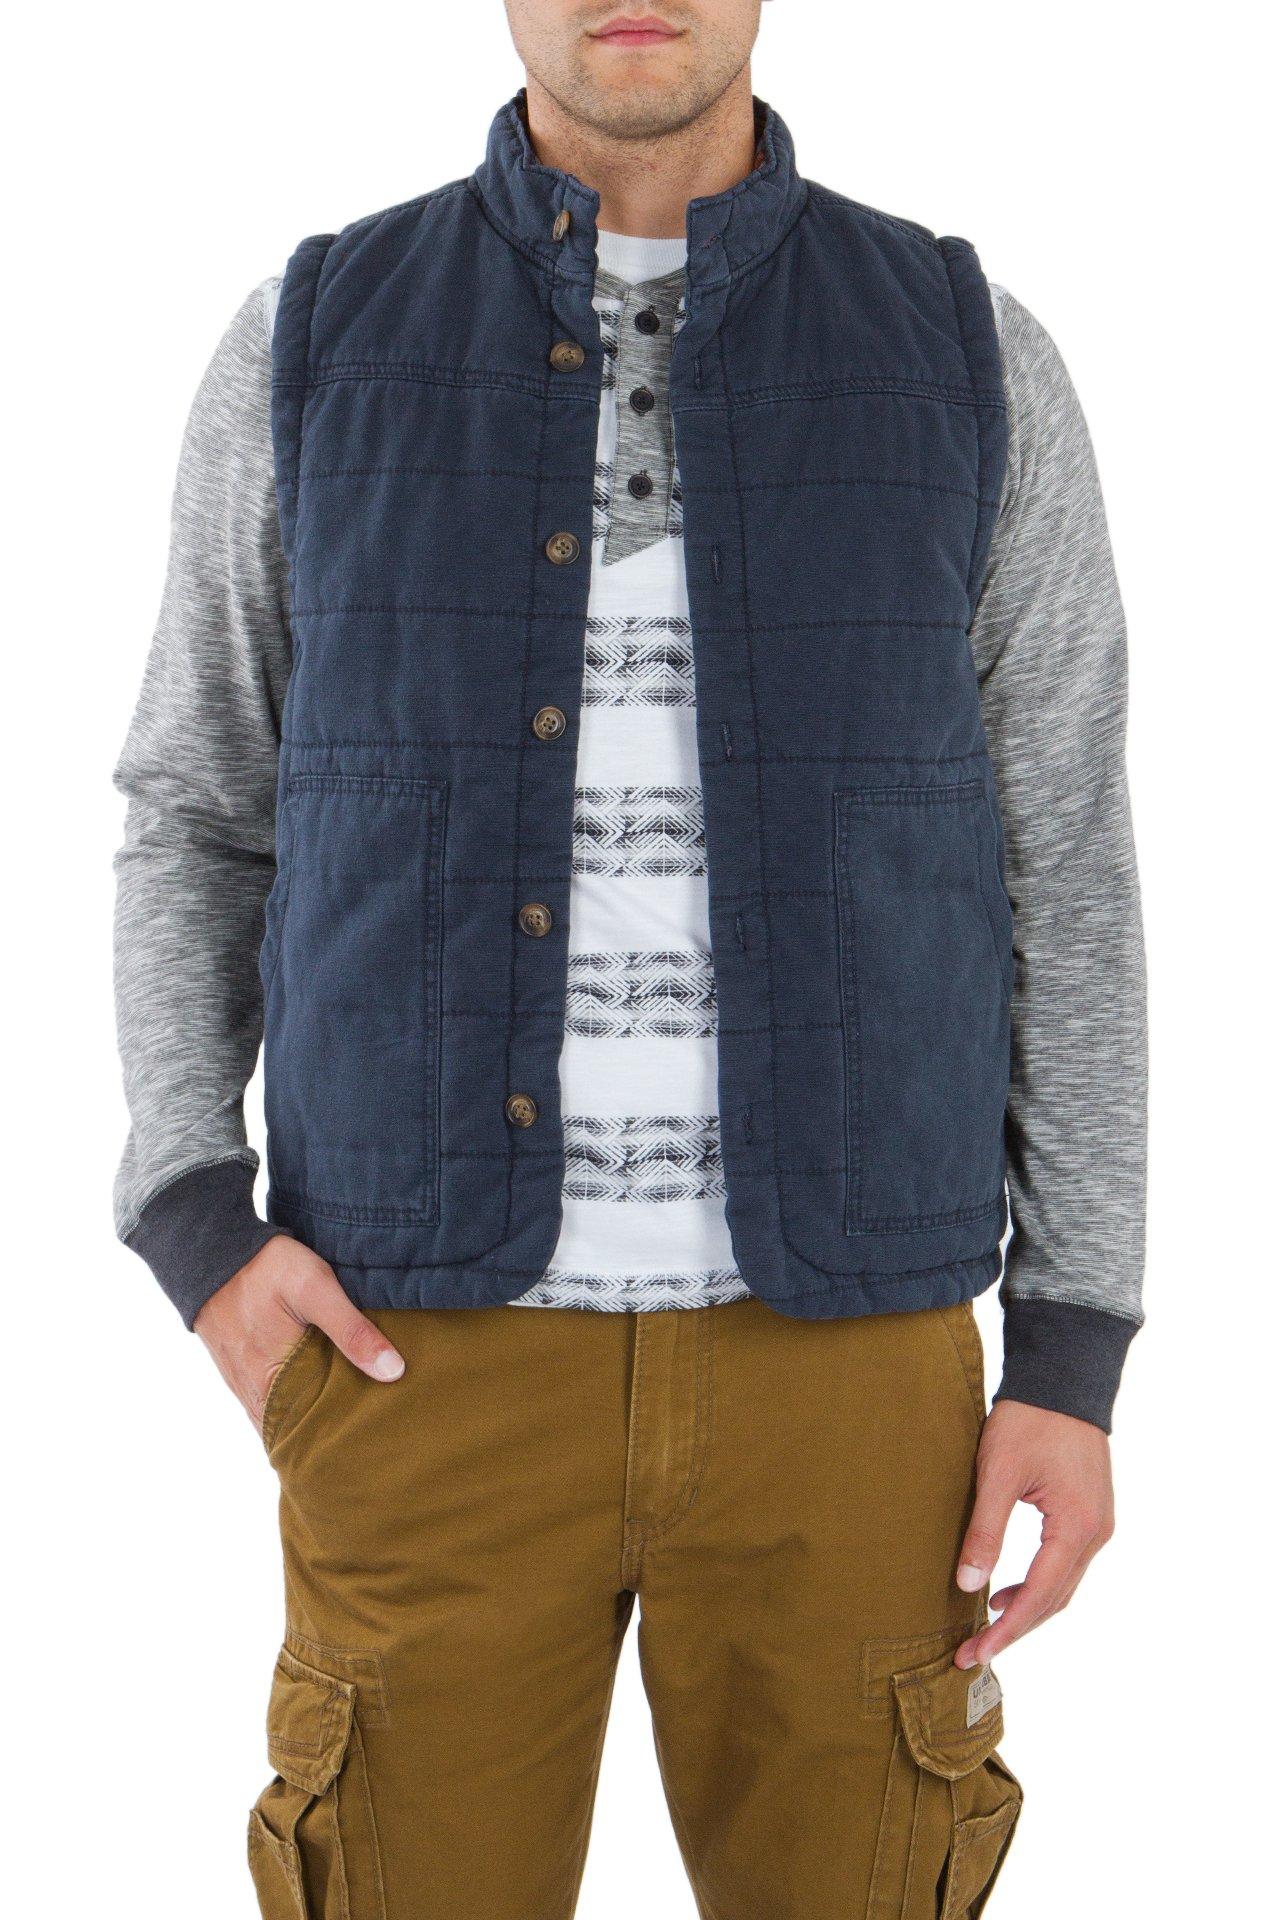 UNIONBAY Men's Flannel Lined Canvas Vest, Twilight, Small